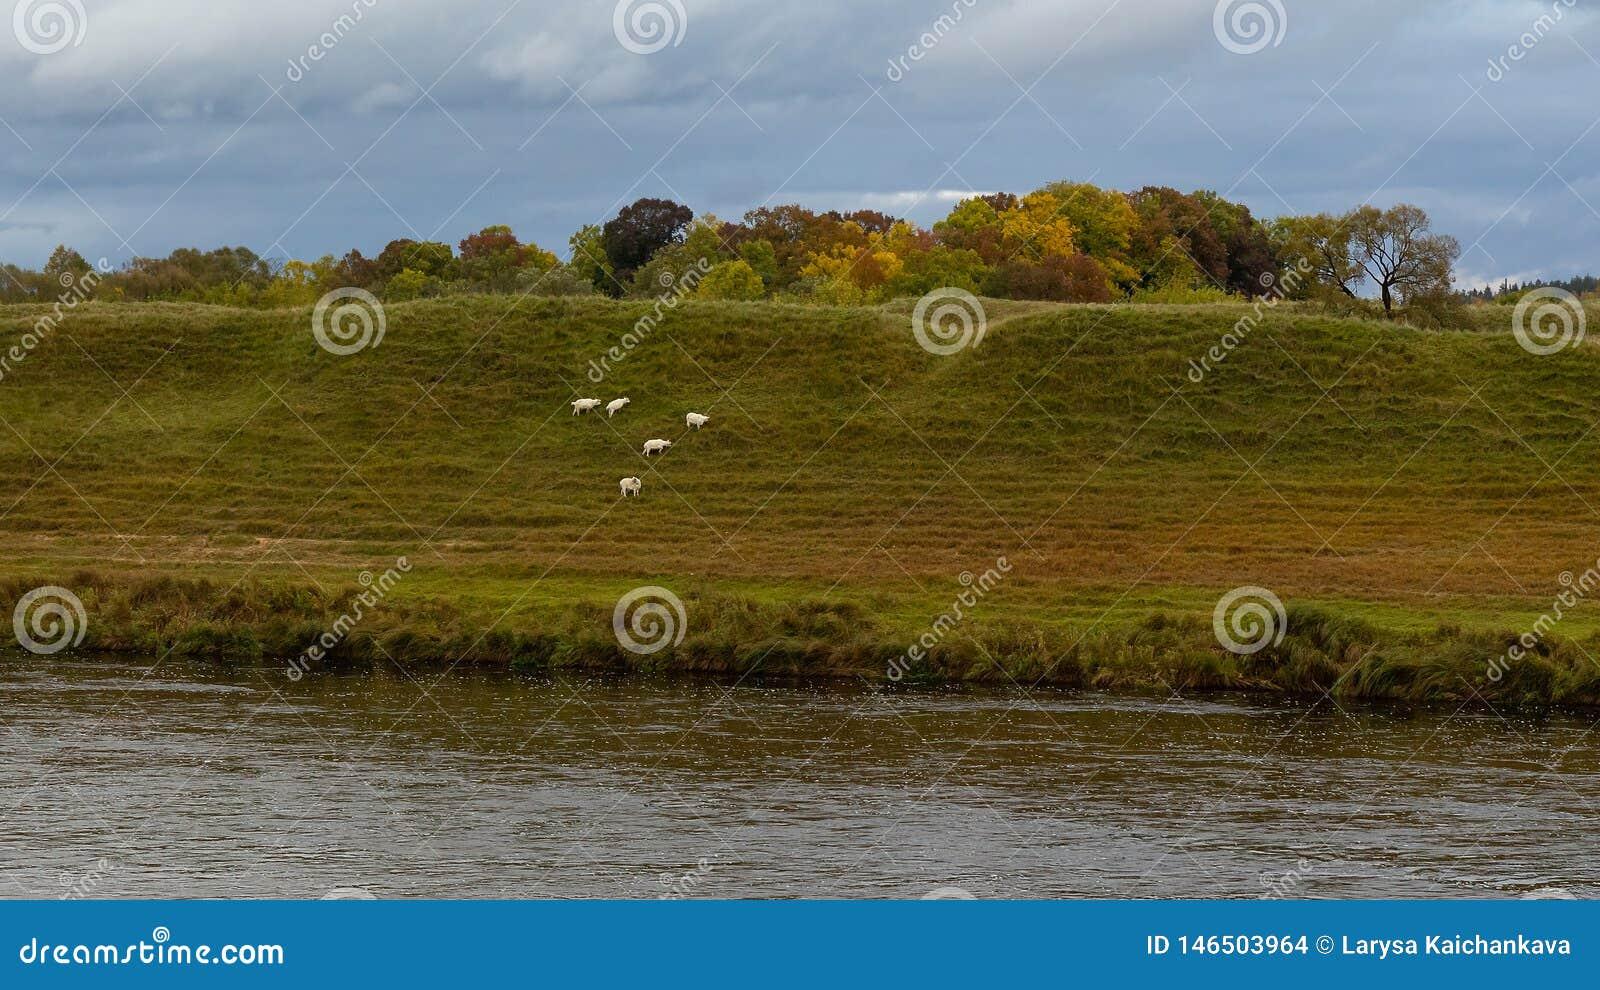 Golden autumn, nature, river, sheep, rain